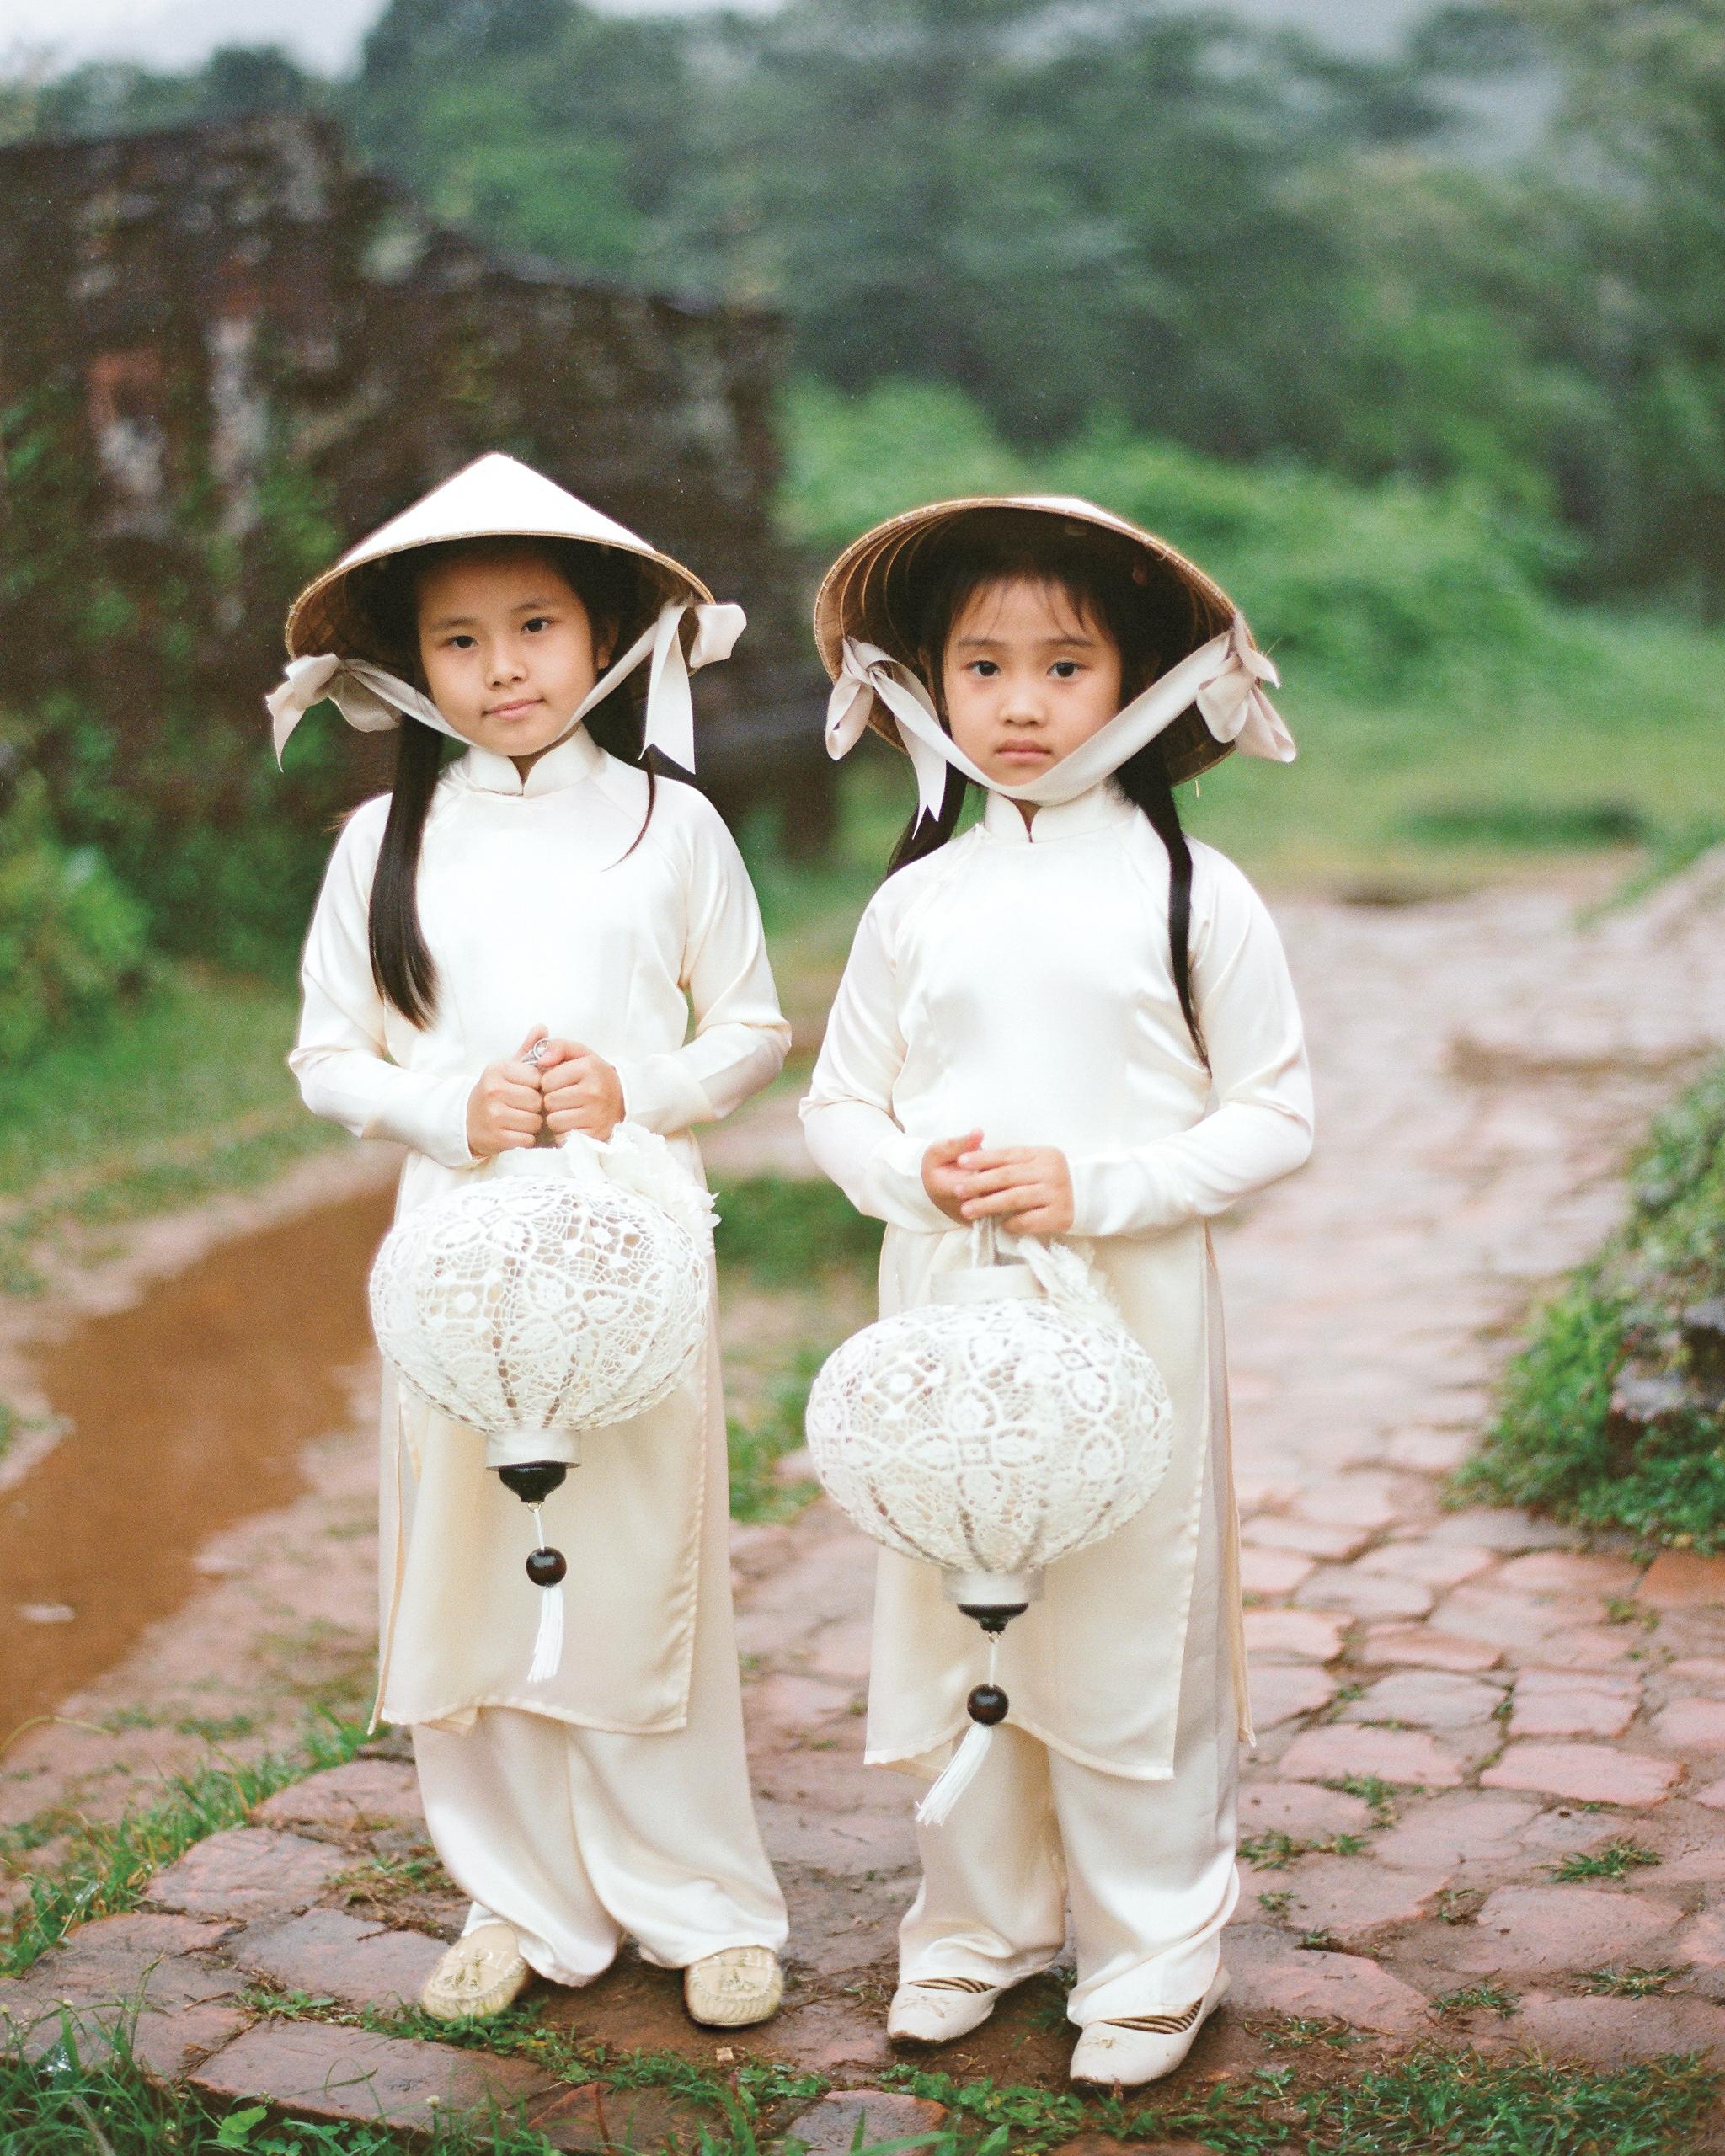 quinn-andy-children-0035-mwds108811.jpg